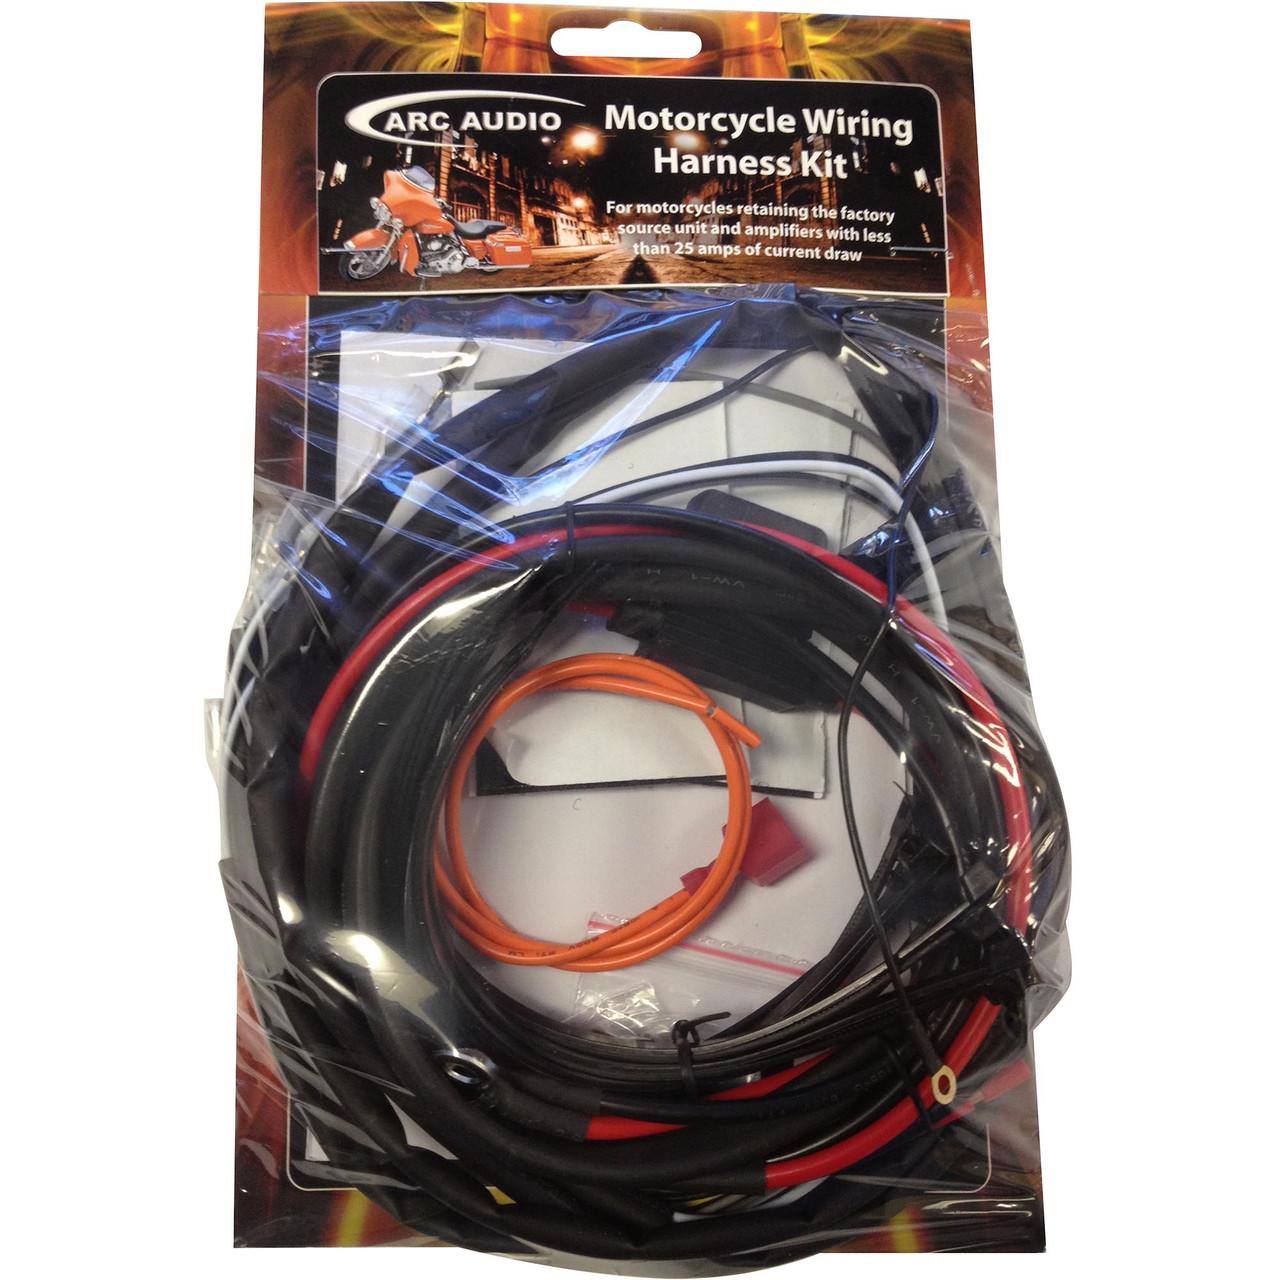 medium resolution of arc wiring harness images gallery arc wiring harness wiring diagrams rh 13 crocodilecruisedarwin com circuit breaker box wiring diagram arc fault